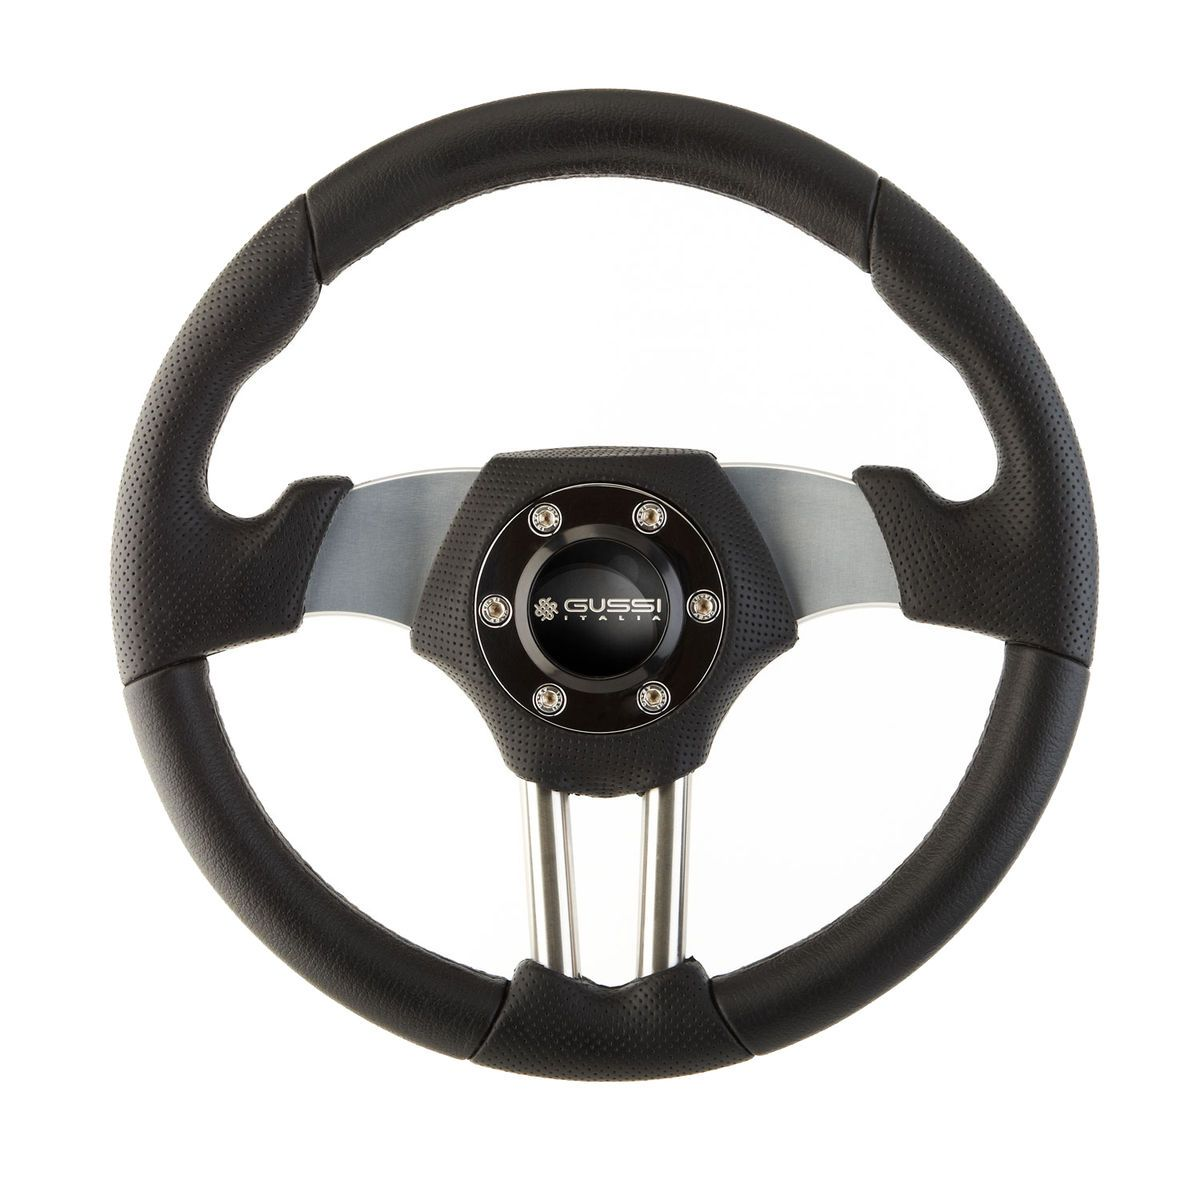 New Gussi Boat Steering Wheel Stainless Steel and Aluminum Black Rim